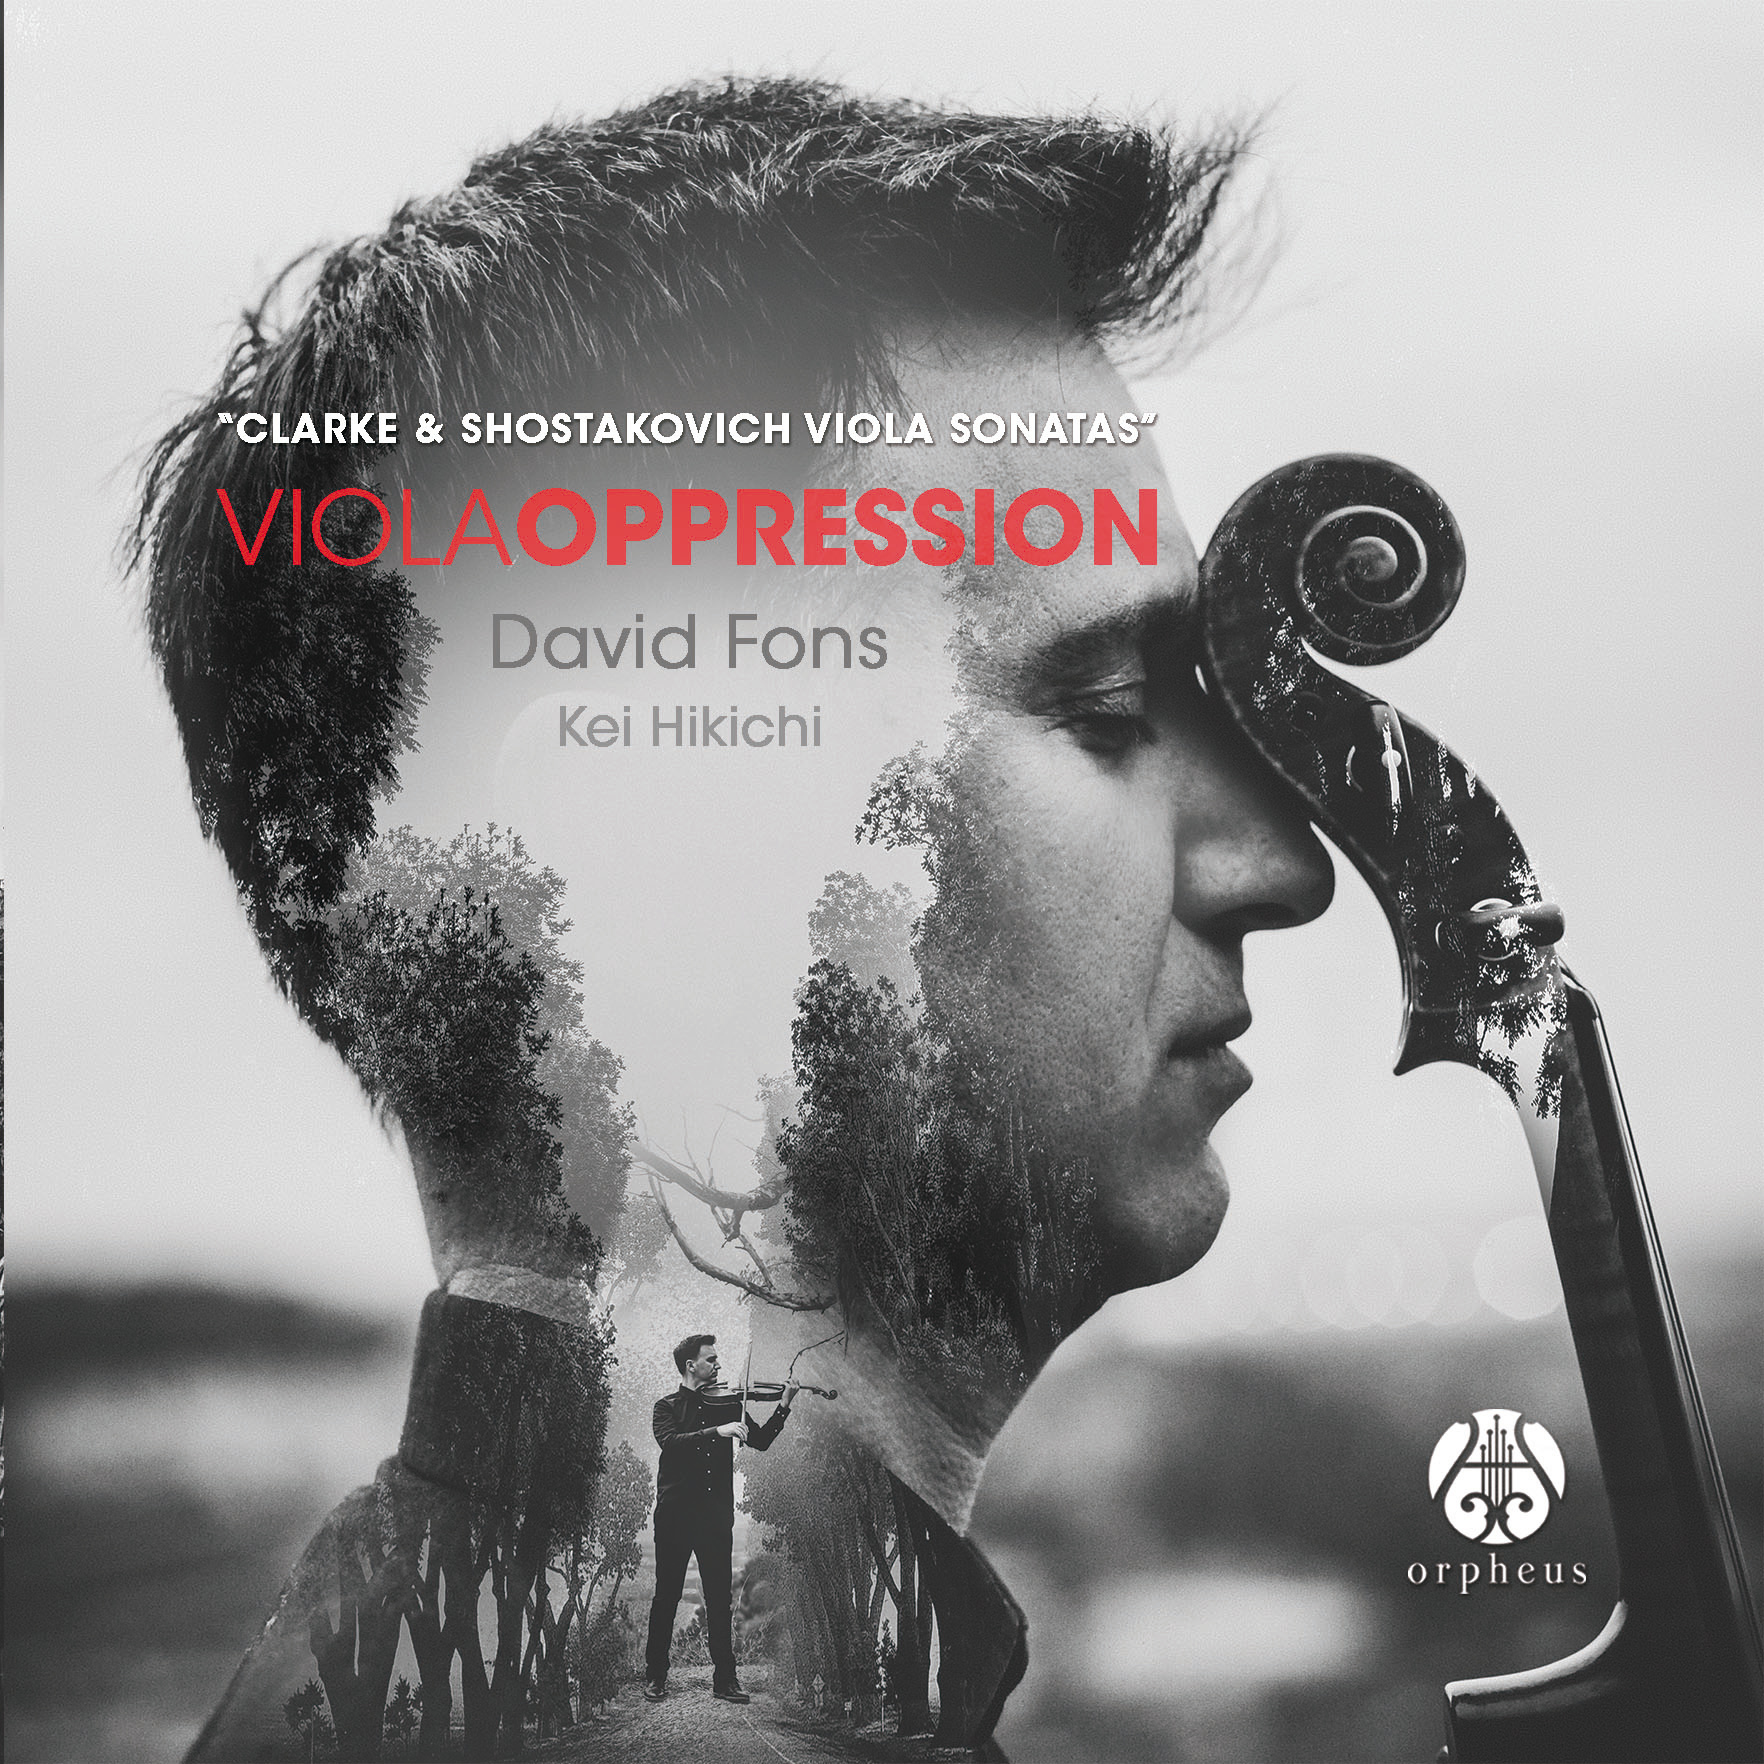 VIOLAOPPRESSION (portada)